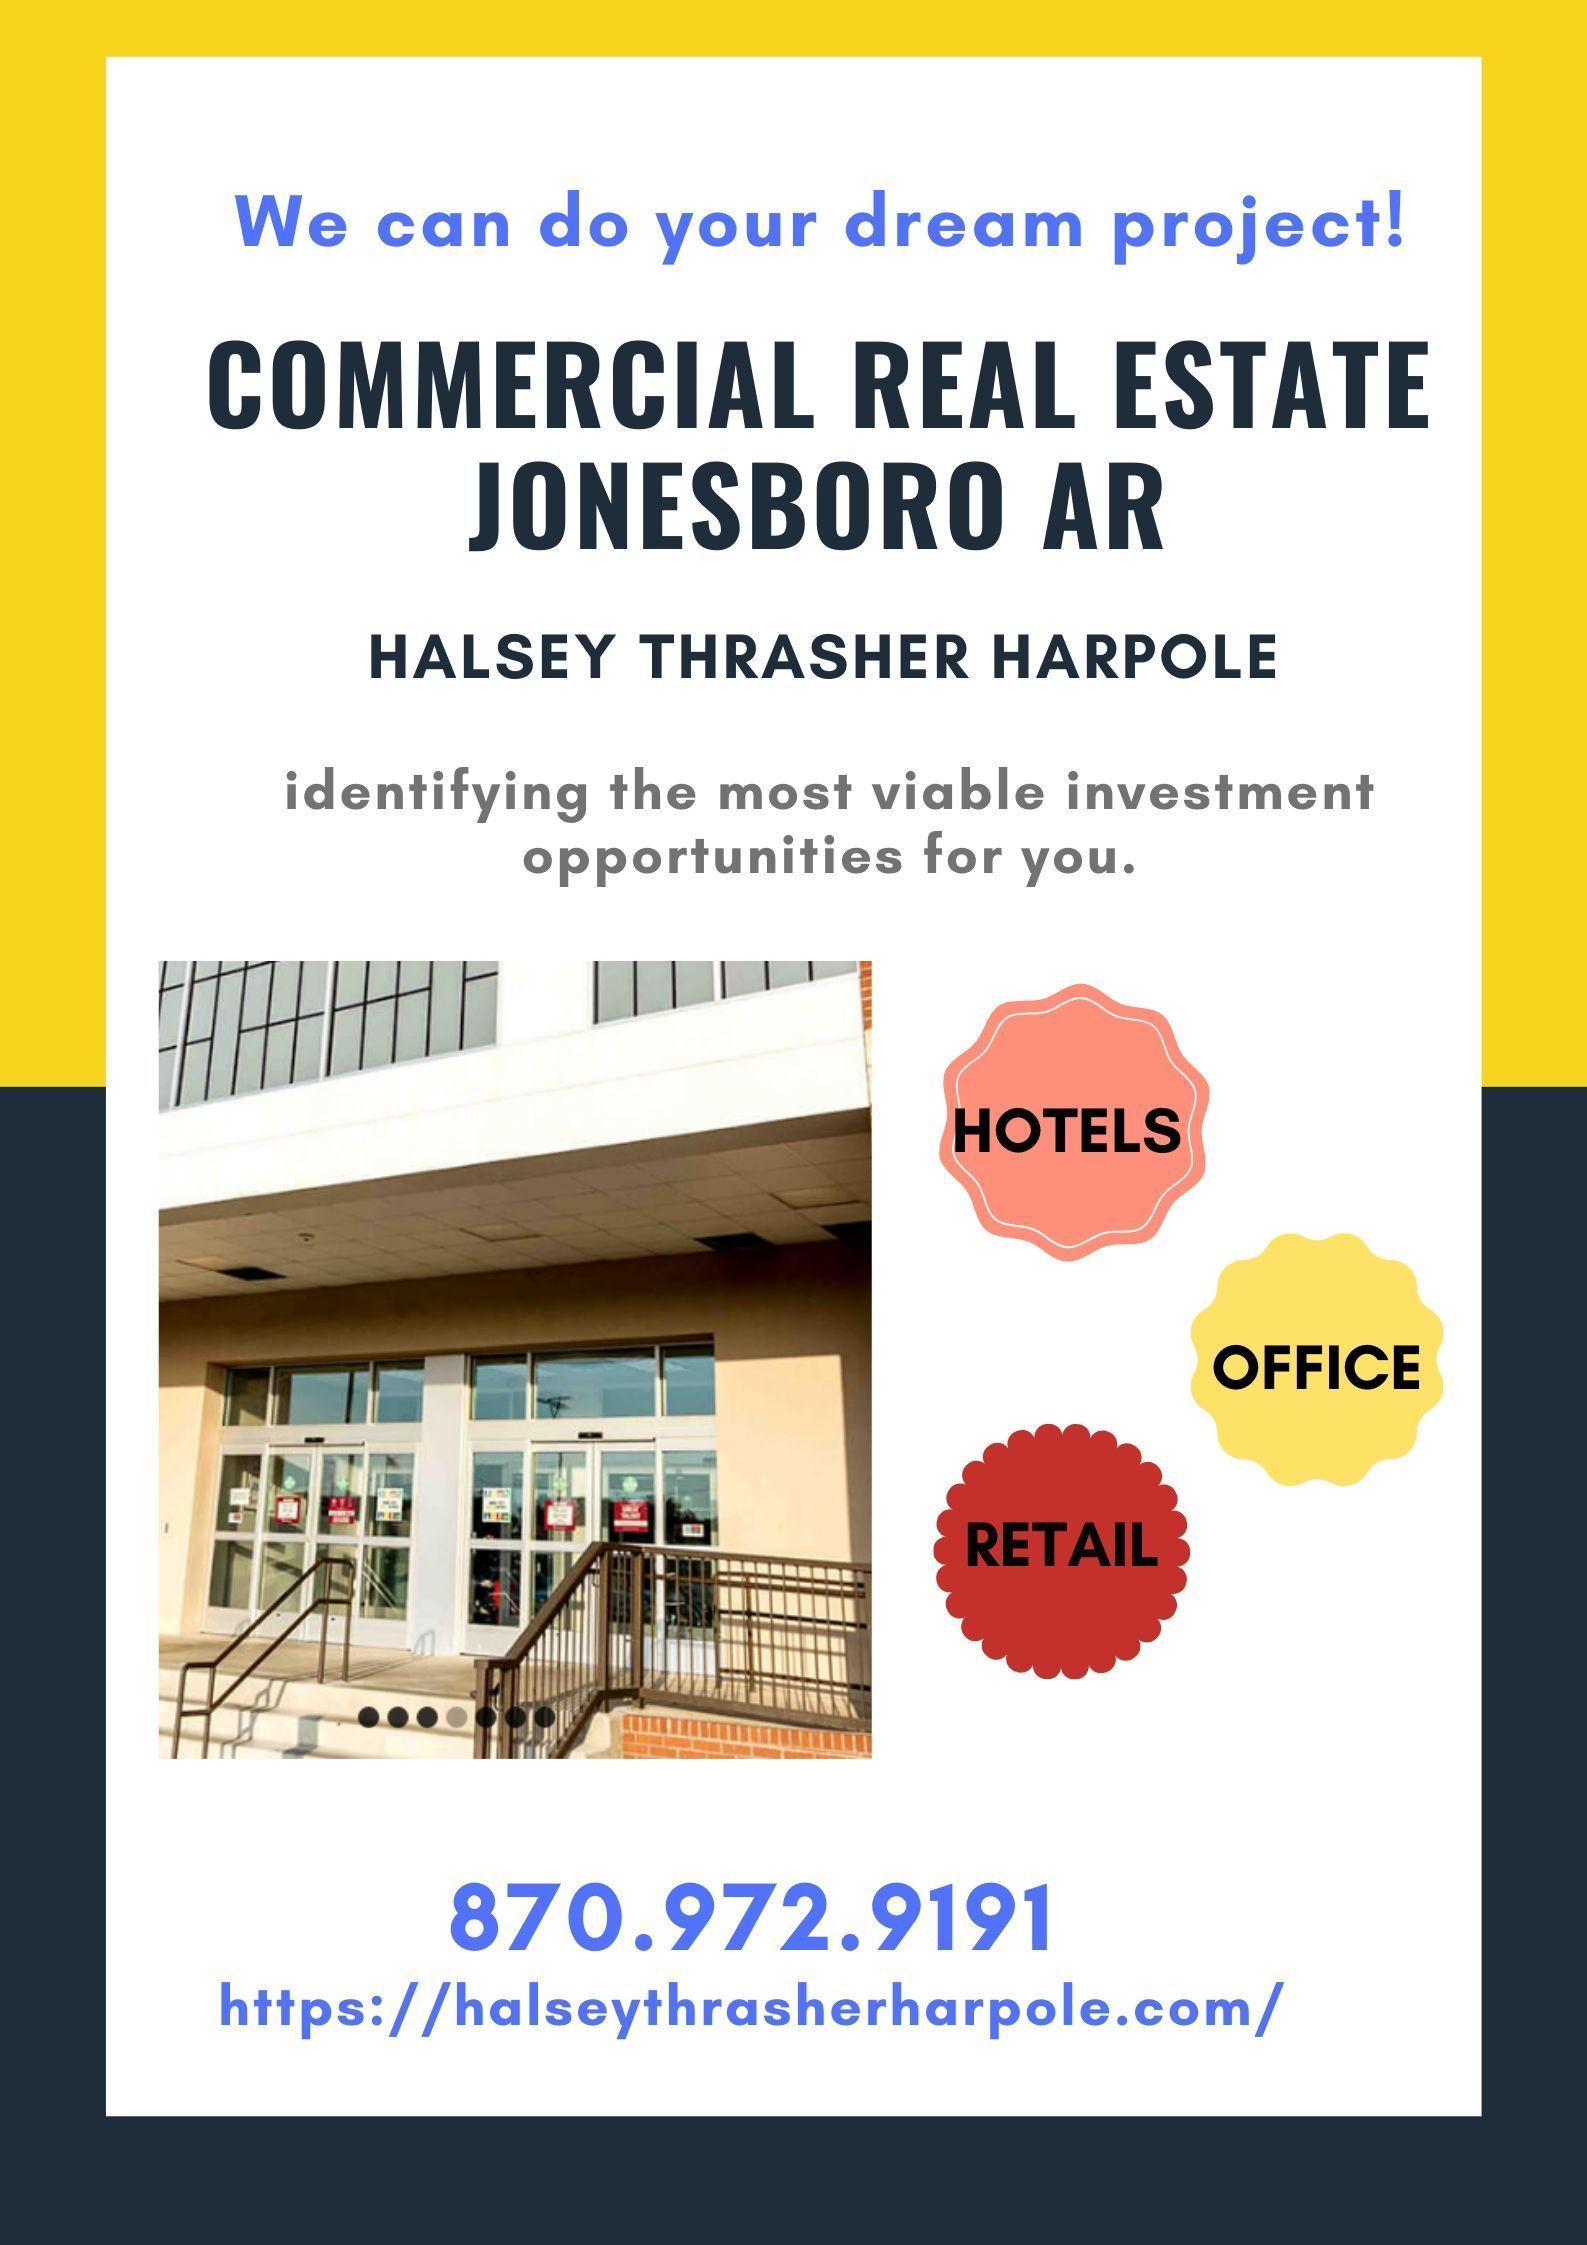 Commercial Real Estate Jonesboro Ar En 2020 Ciales